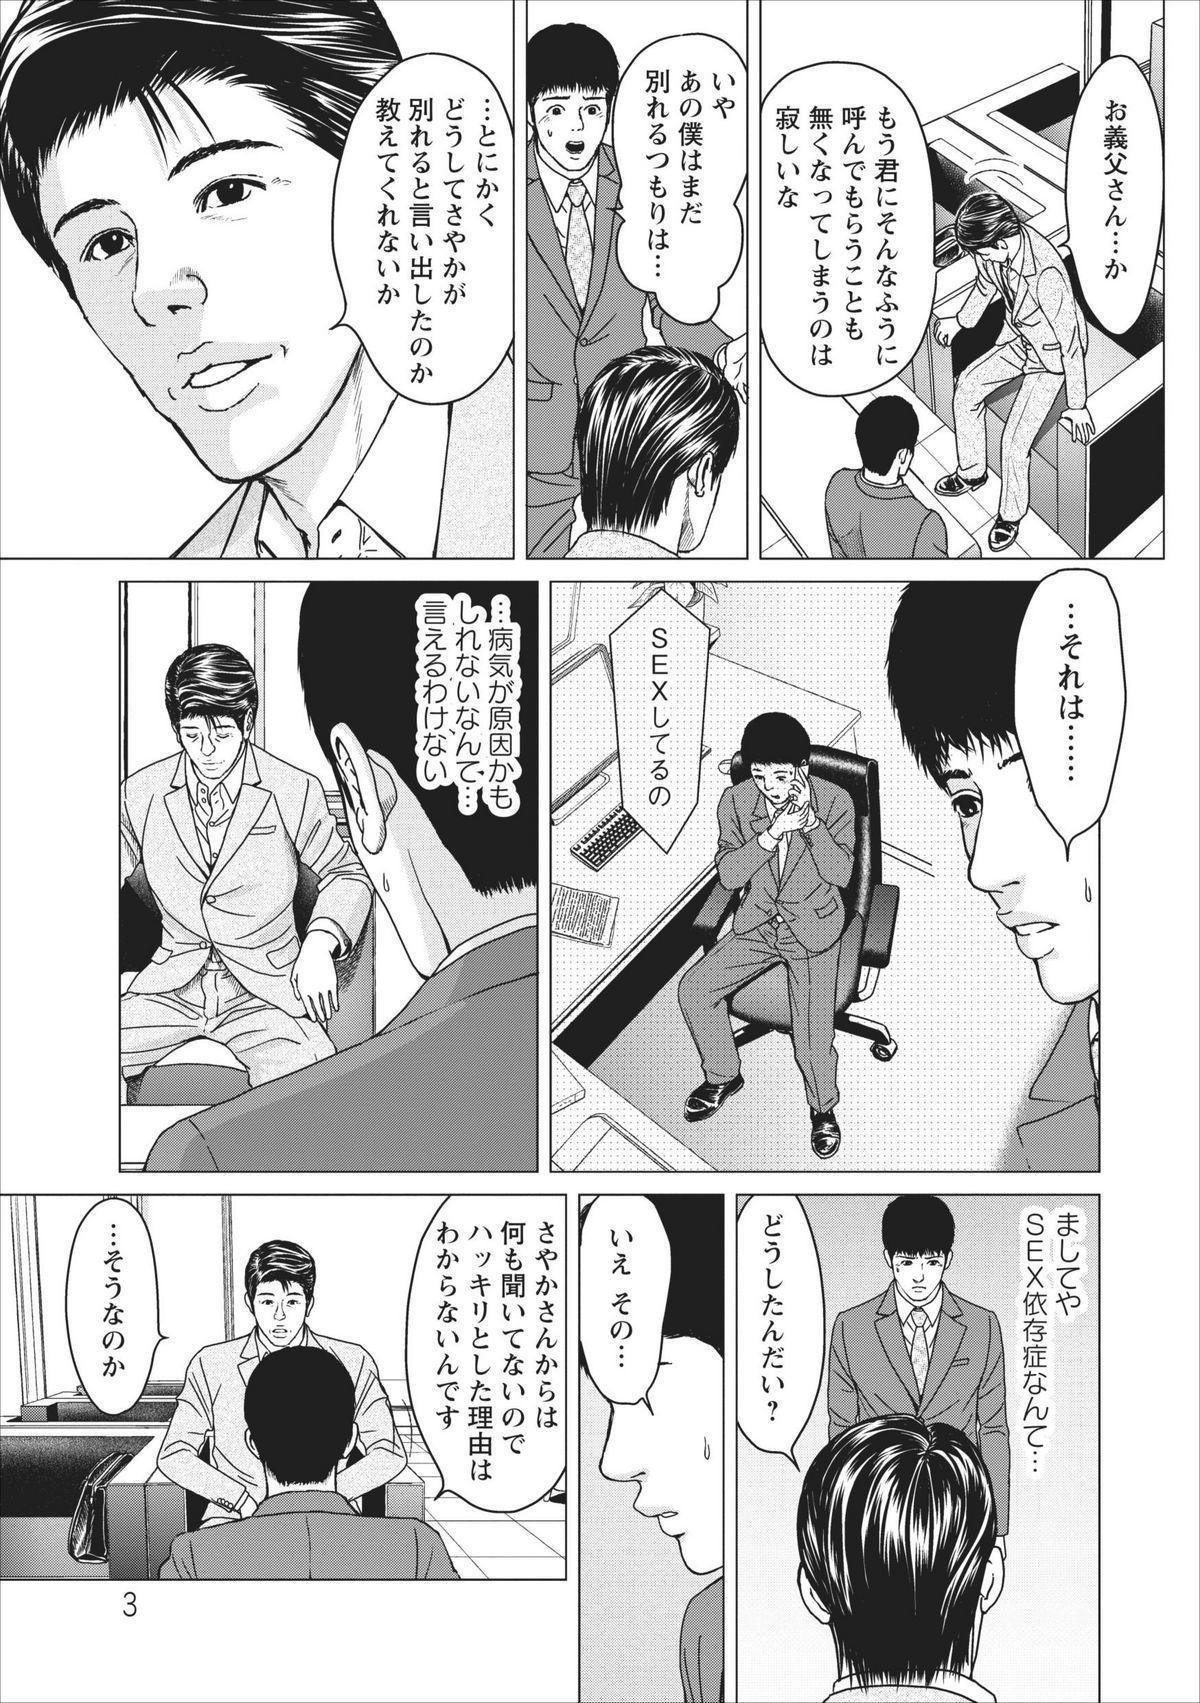 Sex Izonshou ch.9 2